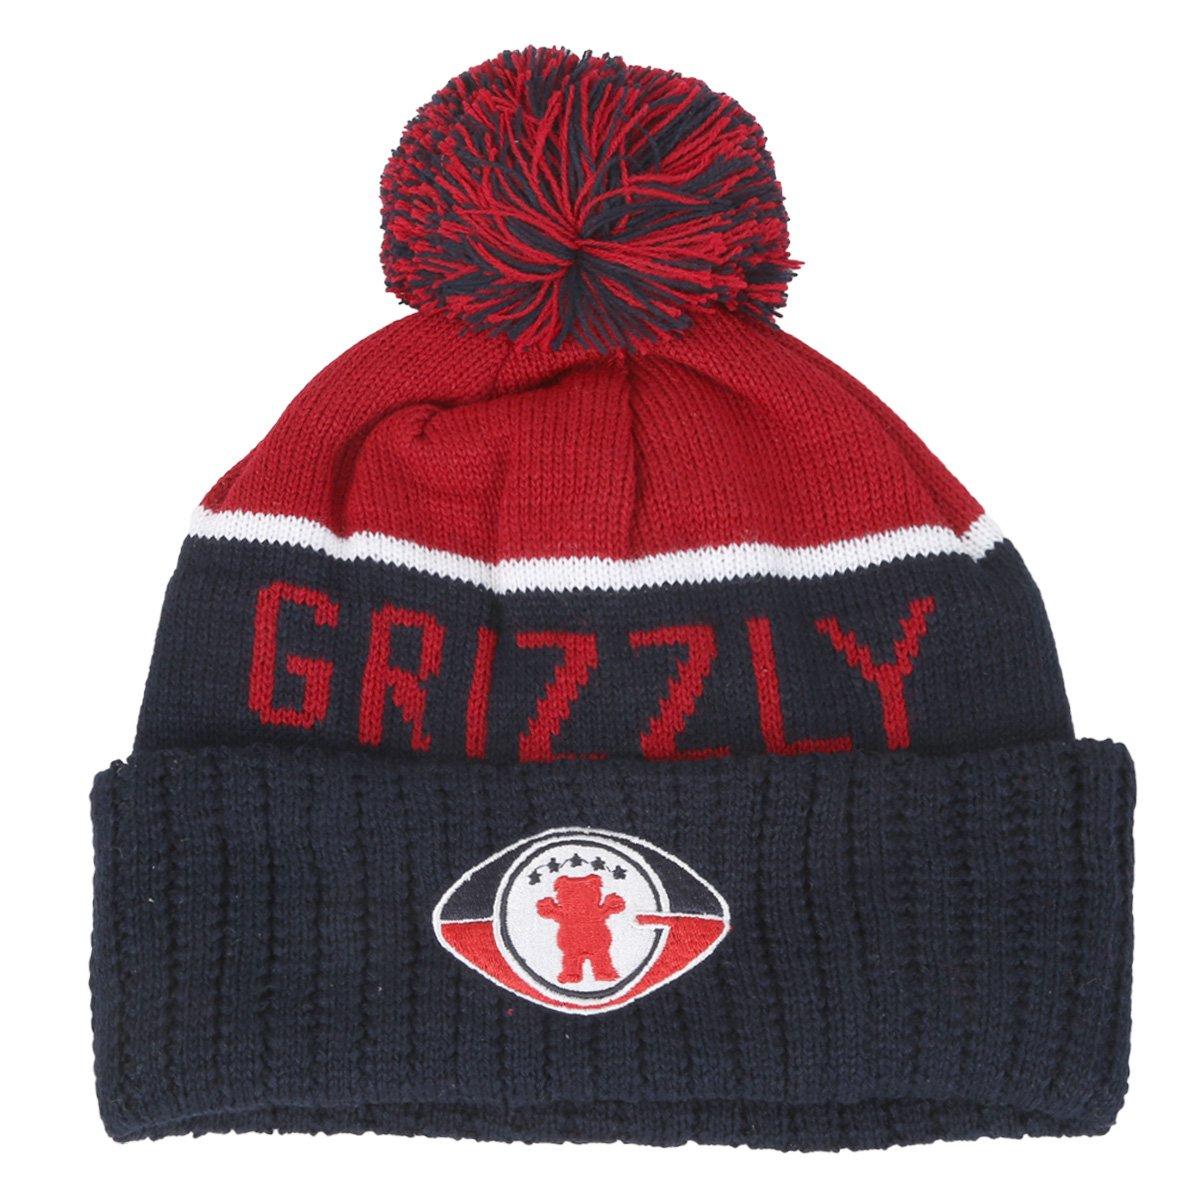 cb742327cd9de Gorro Grizzly Draft Pom Beanie Masculino - Compre Agora